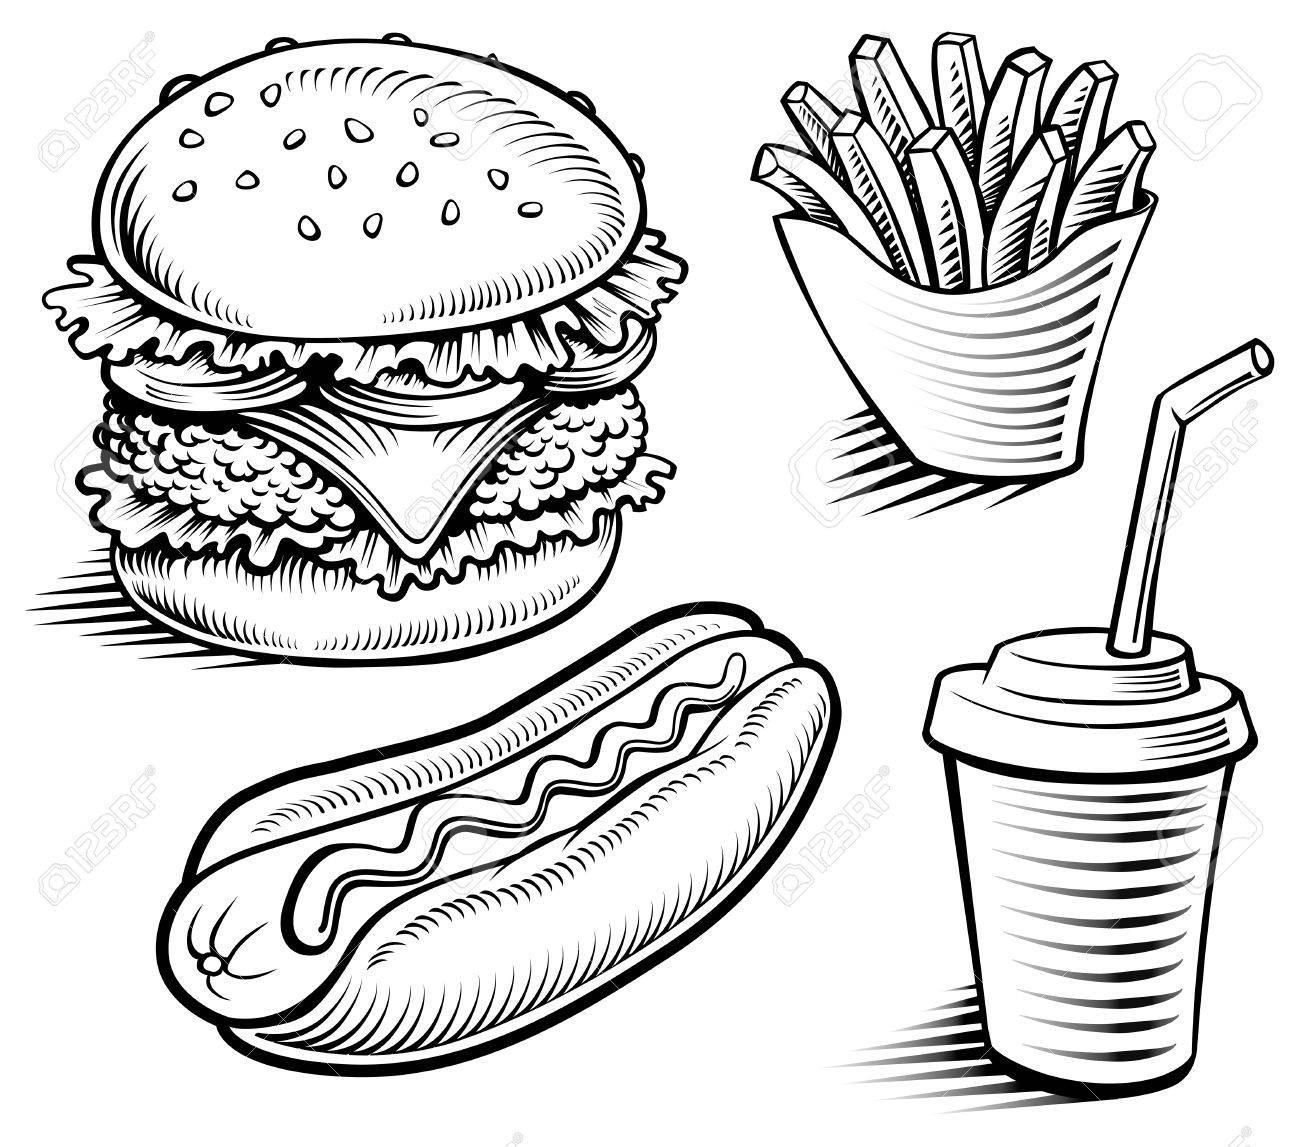 1300x1147 Fast Food hamburger, Fries, Hotdog, Drink Hand Drawing Royalty